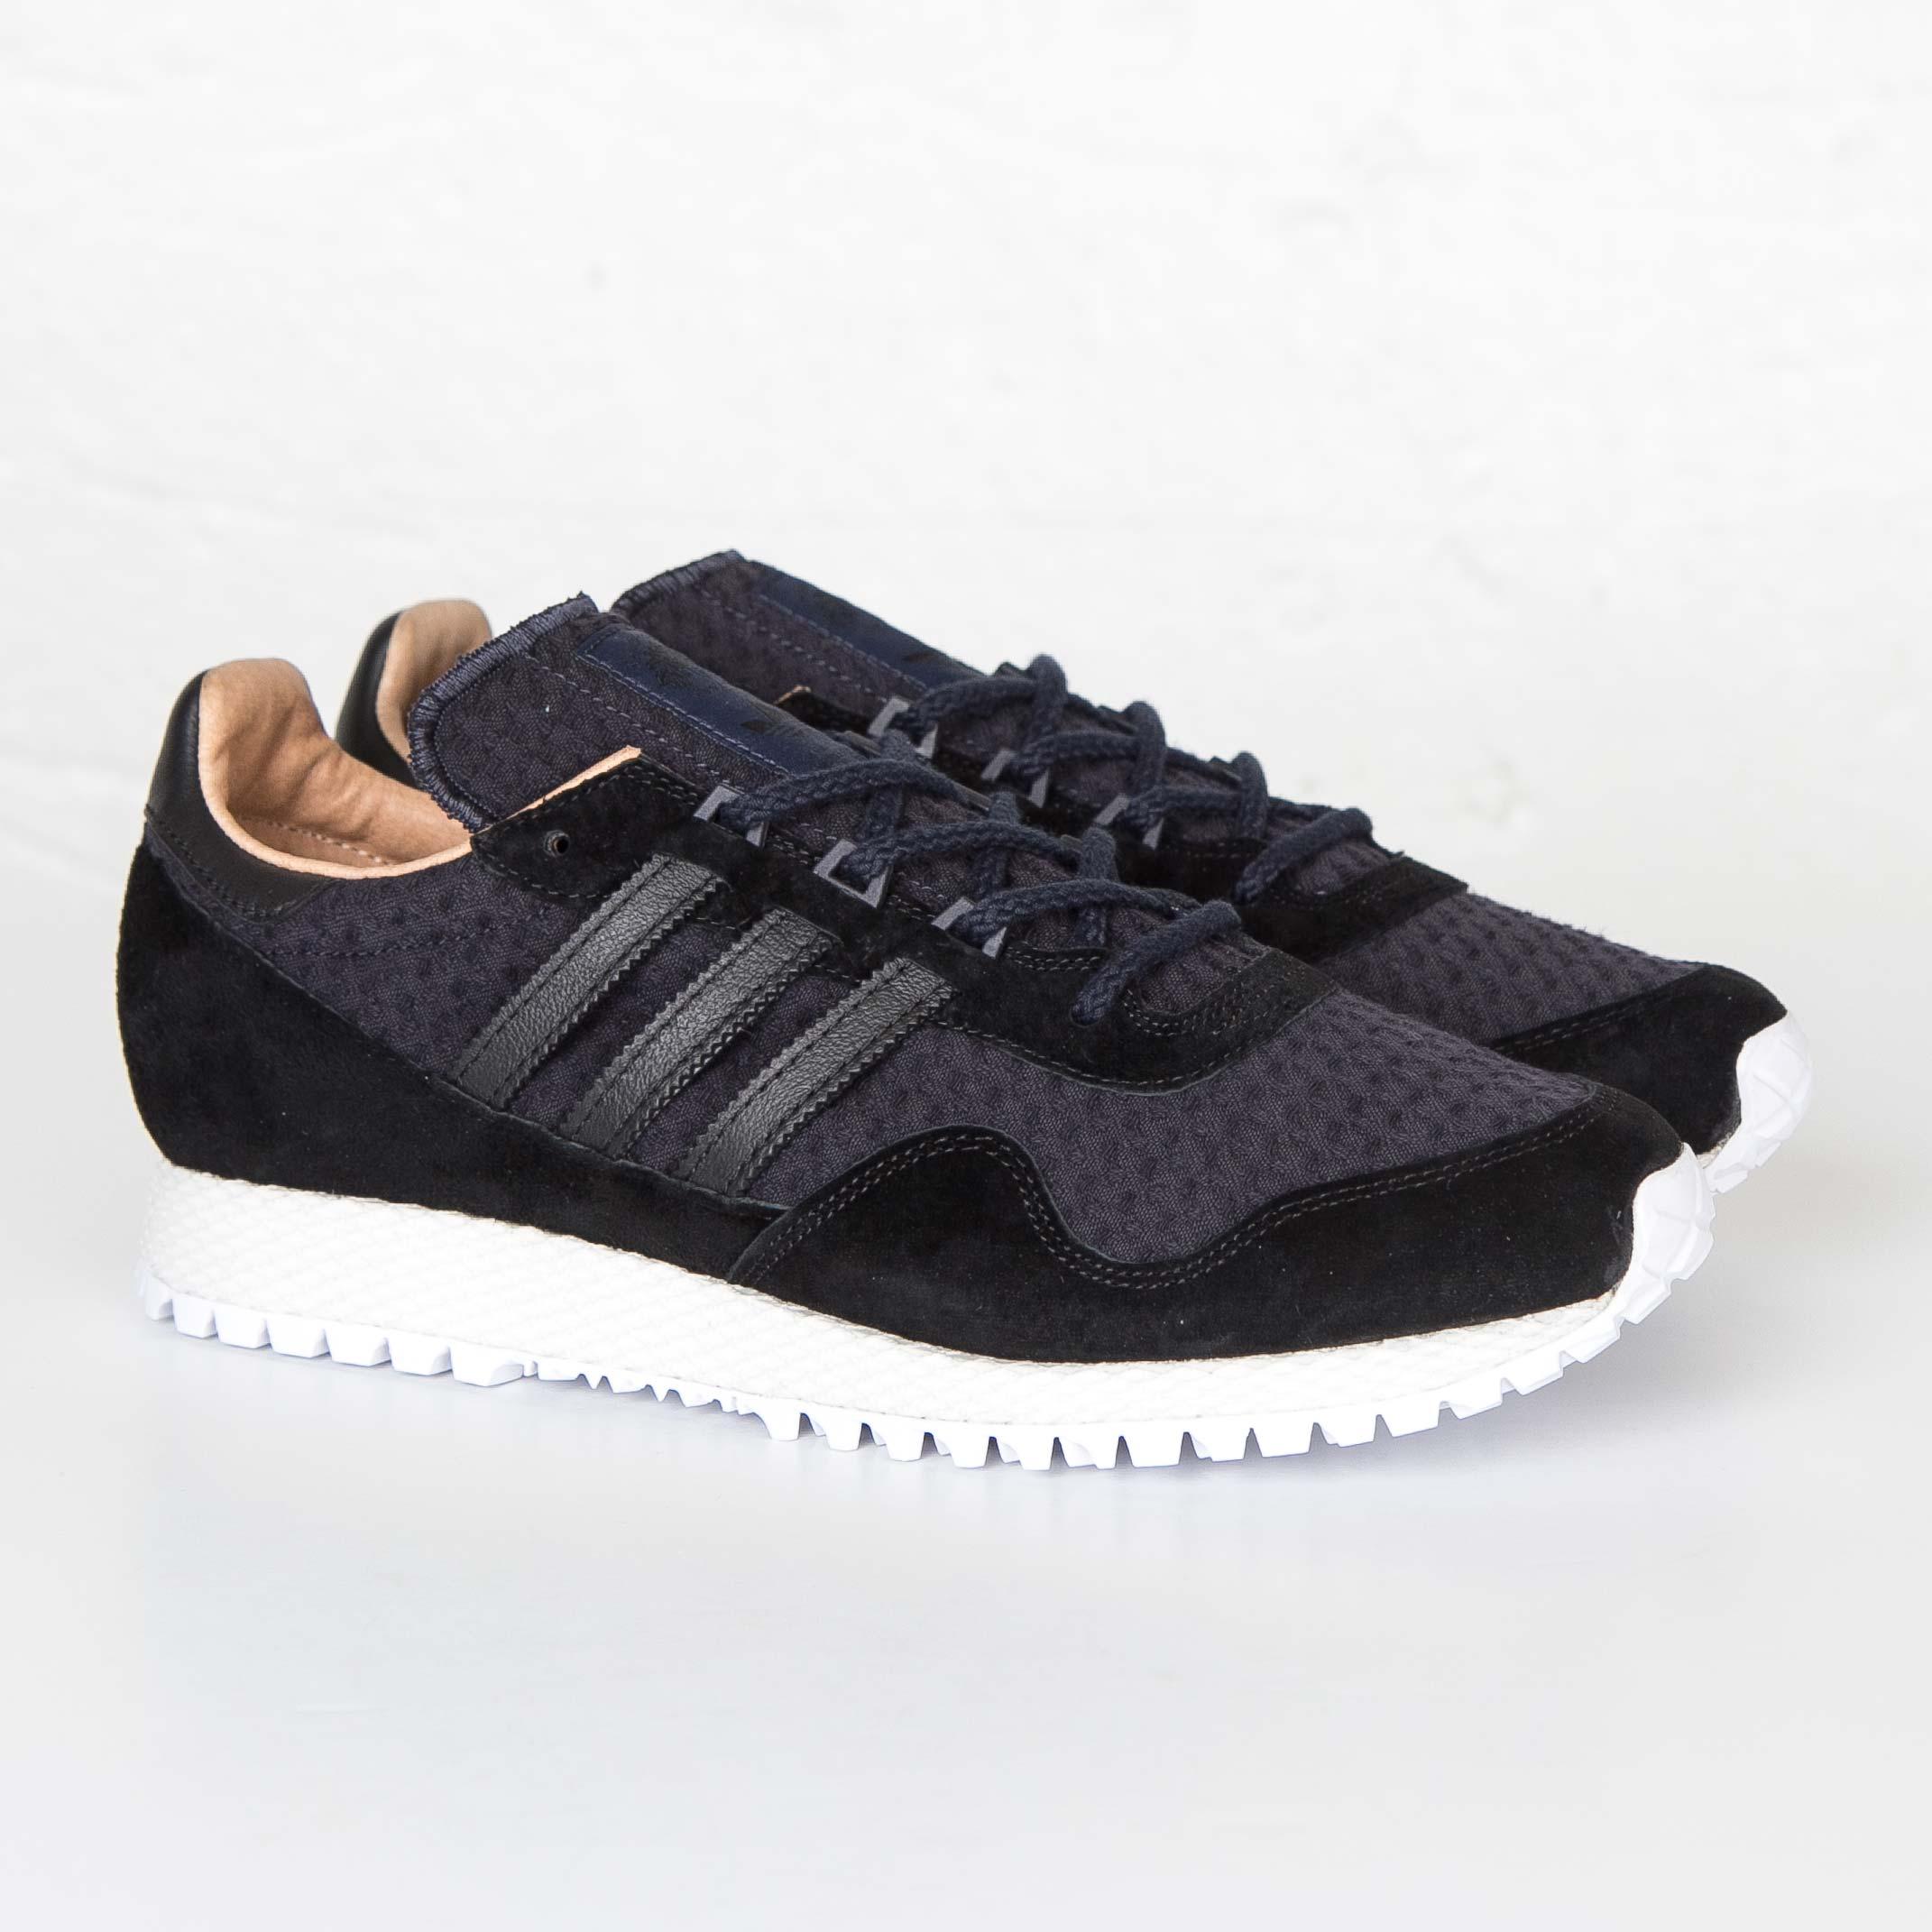 Adidas Nuevo Boost herr